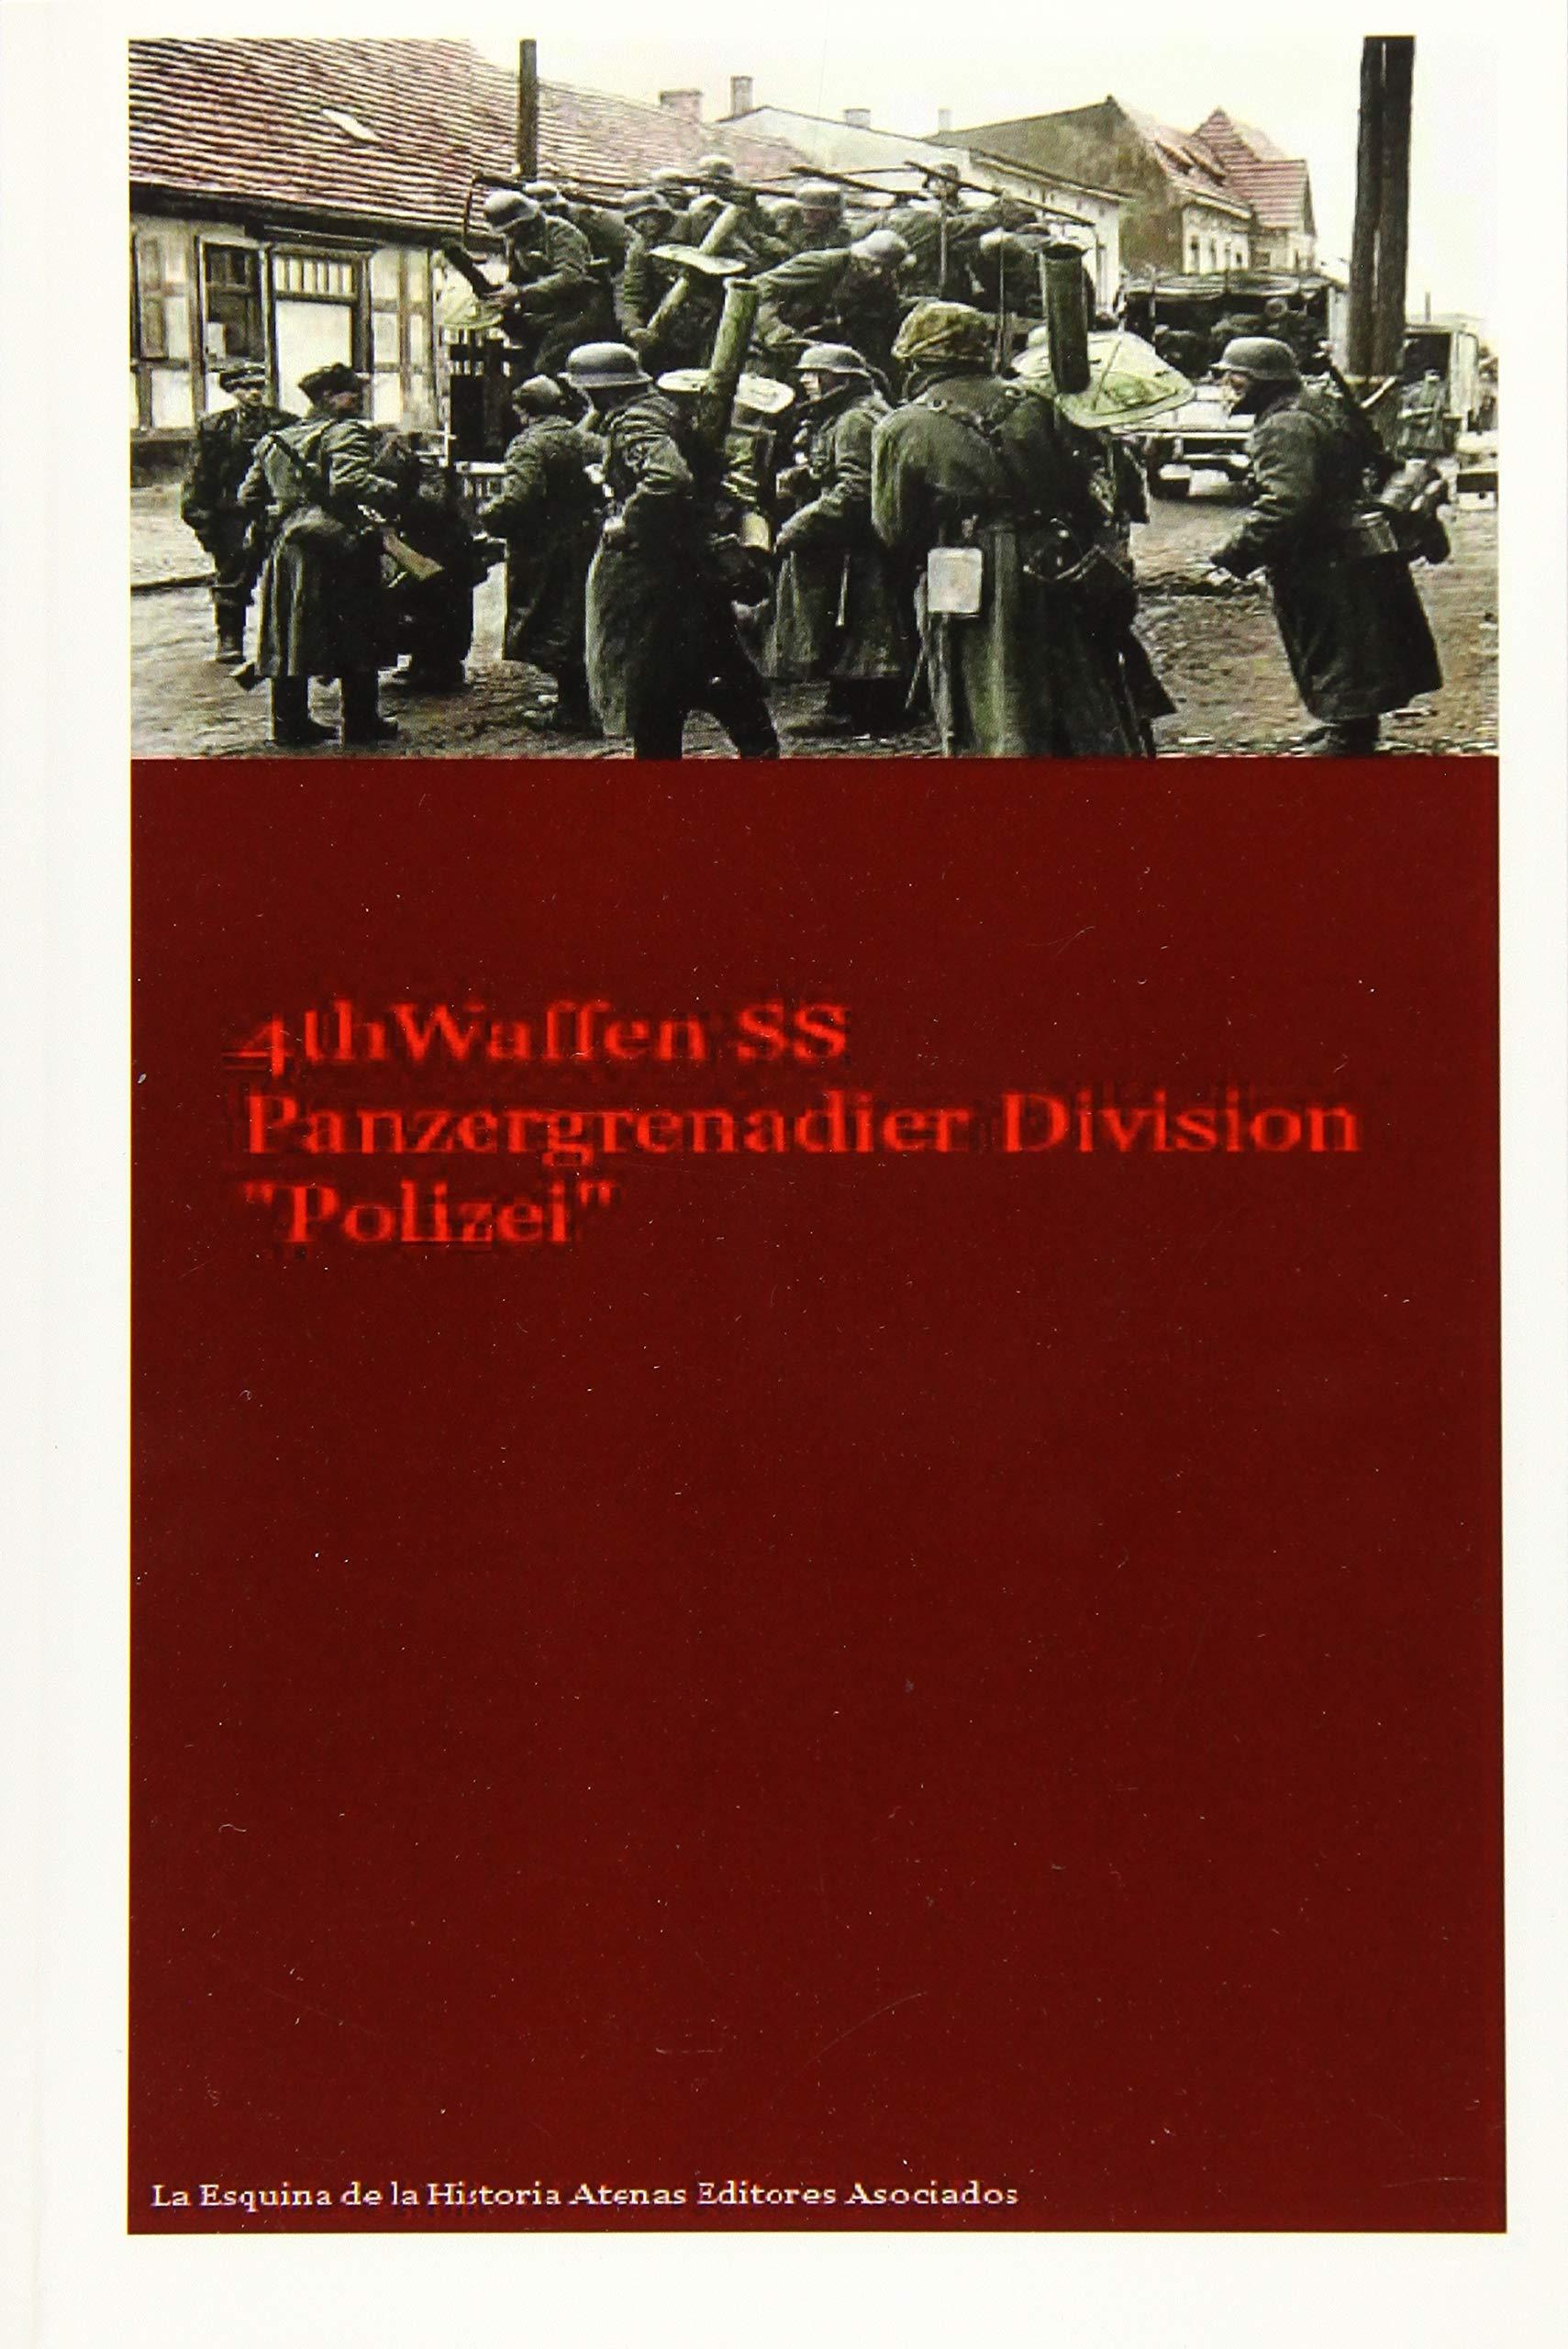 4th Waffen SS Panzergrenadier Division